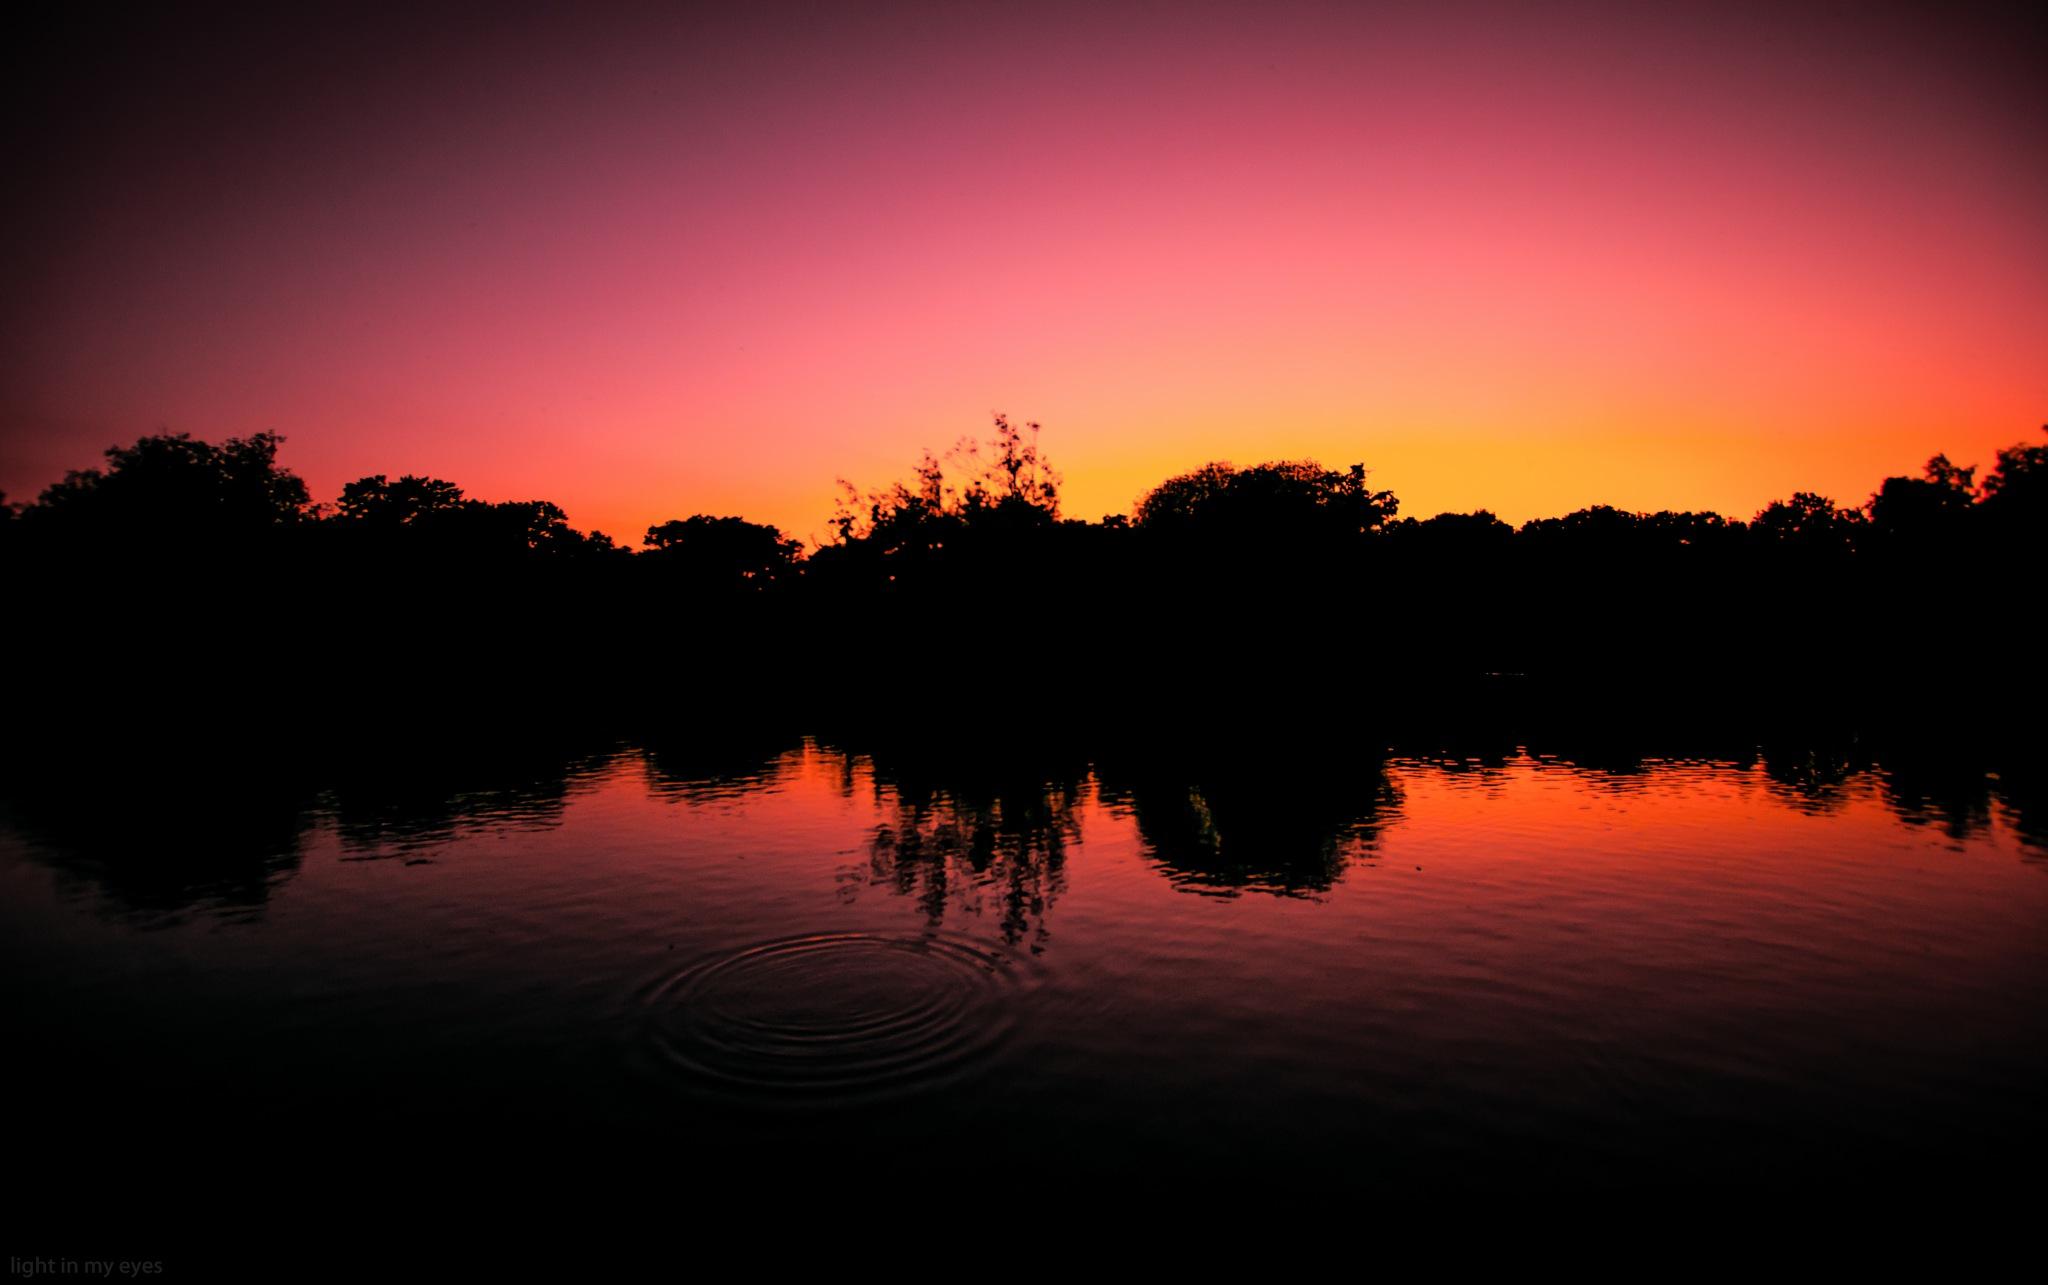 sun down by neil.hickman1